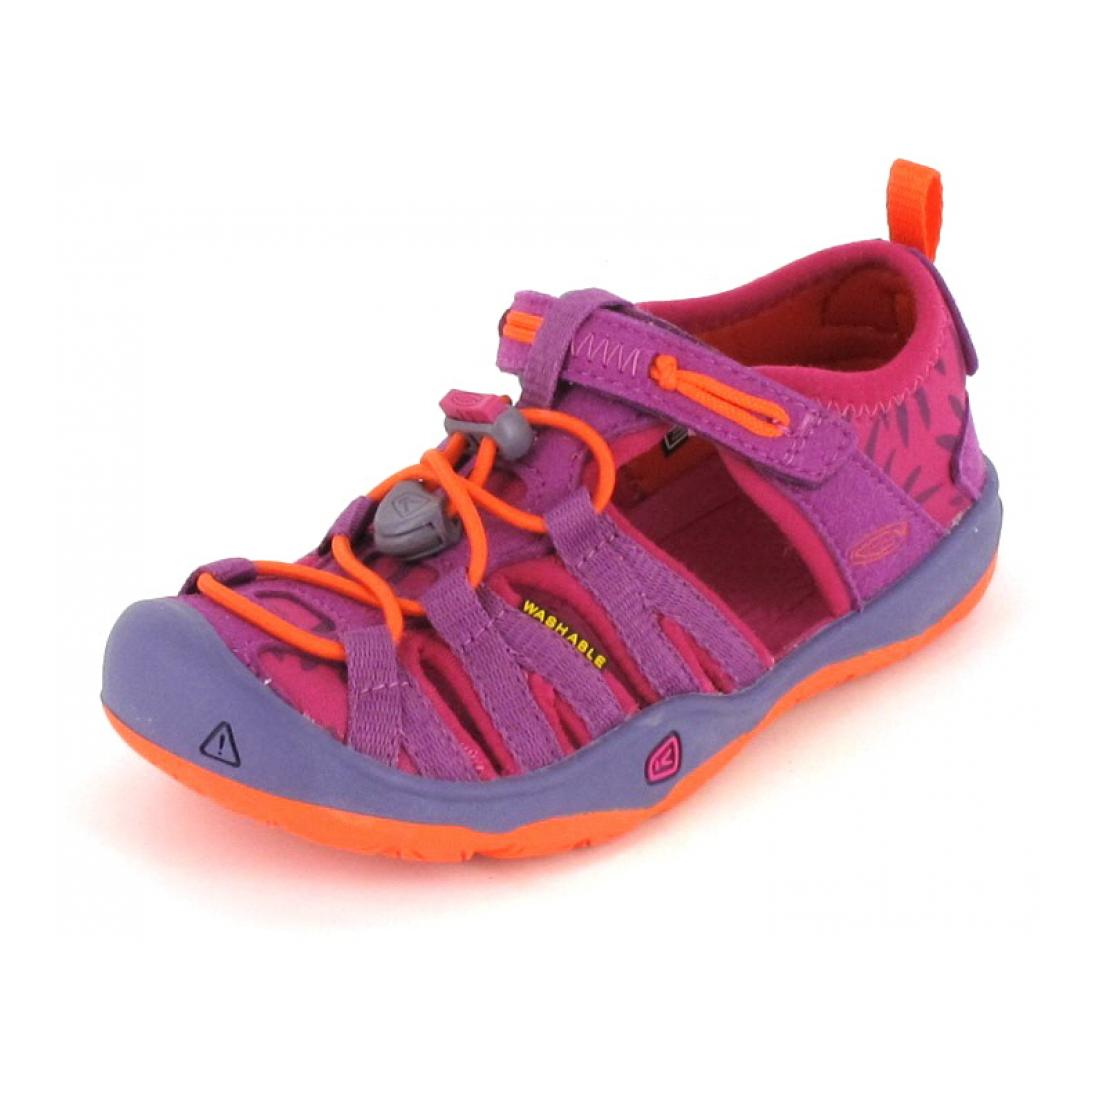 KEEN Sandale Moxie Sandal